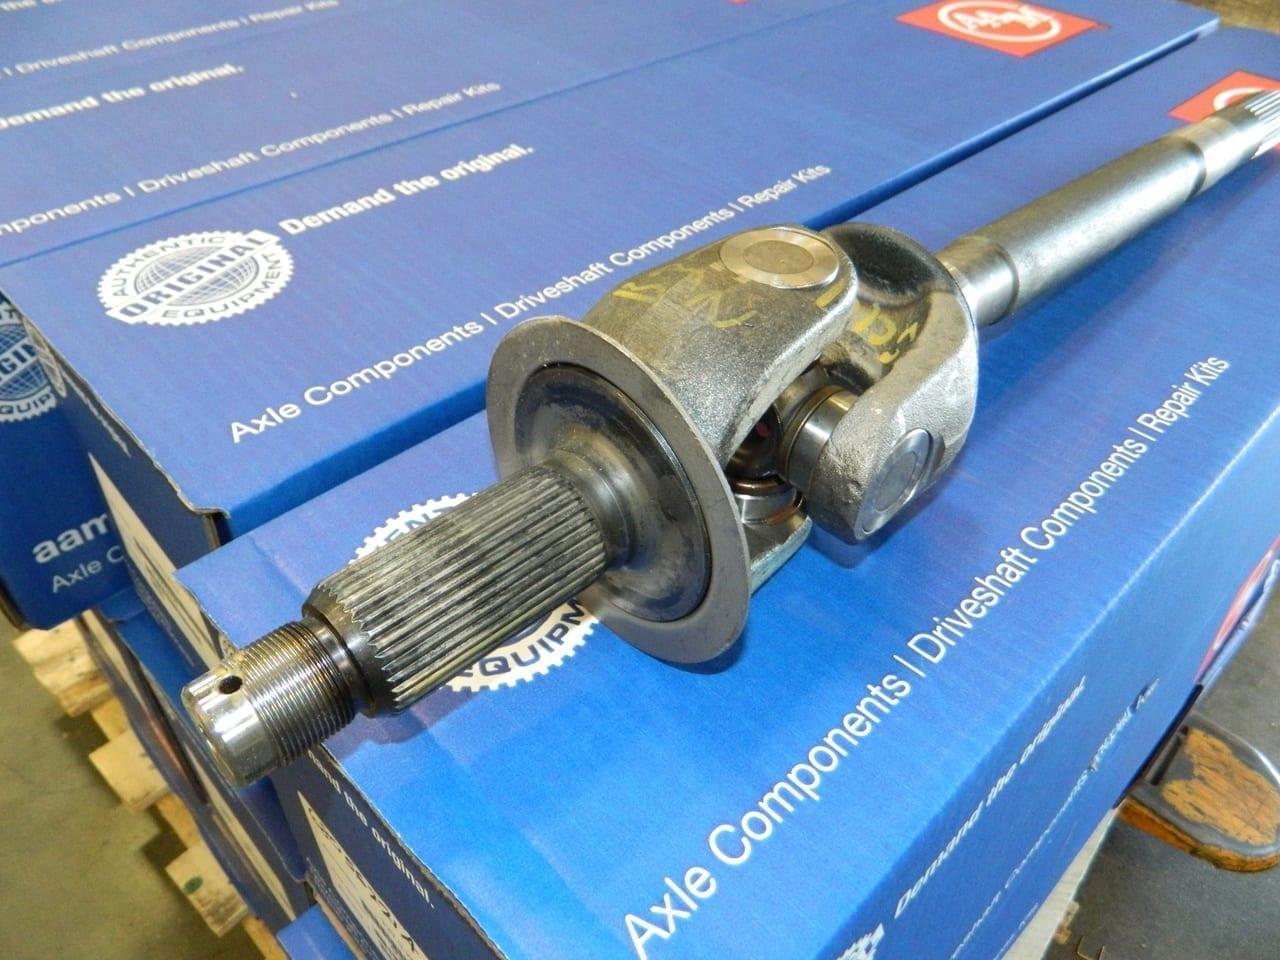 Dodge Driveshaft 4X4 Front Axle AAM 1485 Universal Joint 2003 Ram 2500 3500 OEM